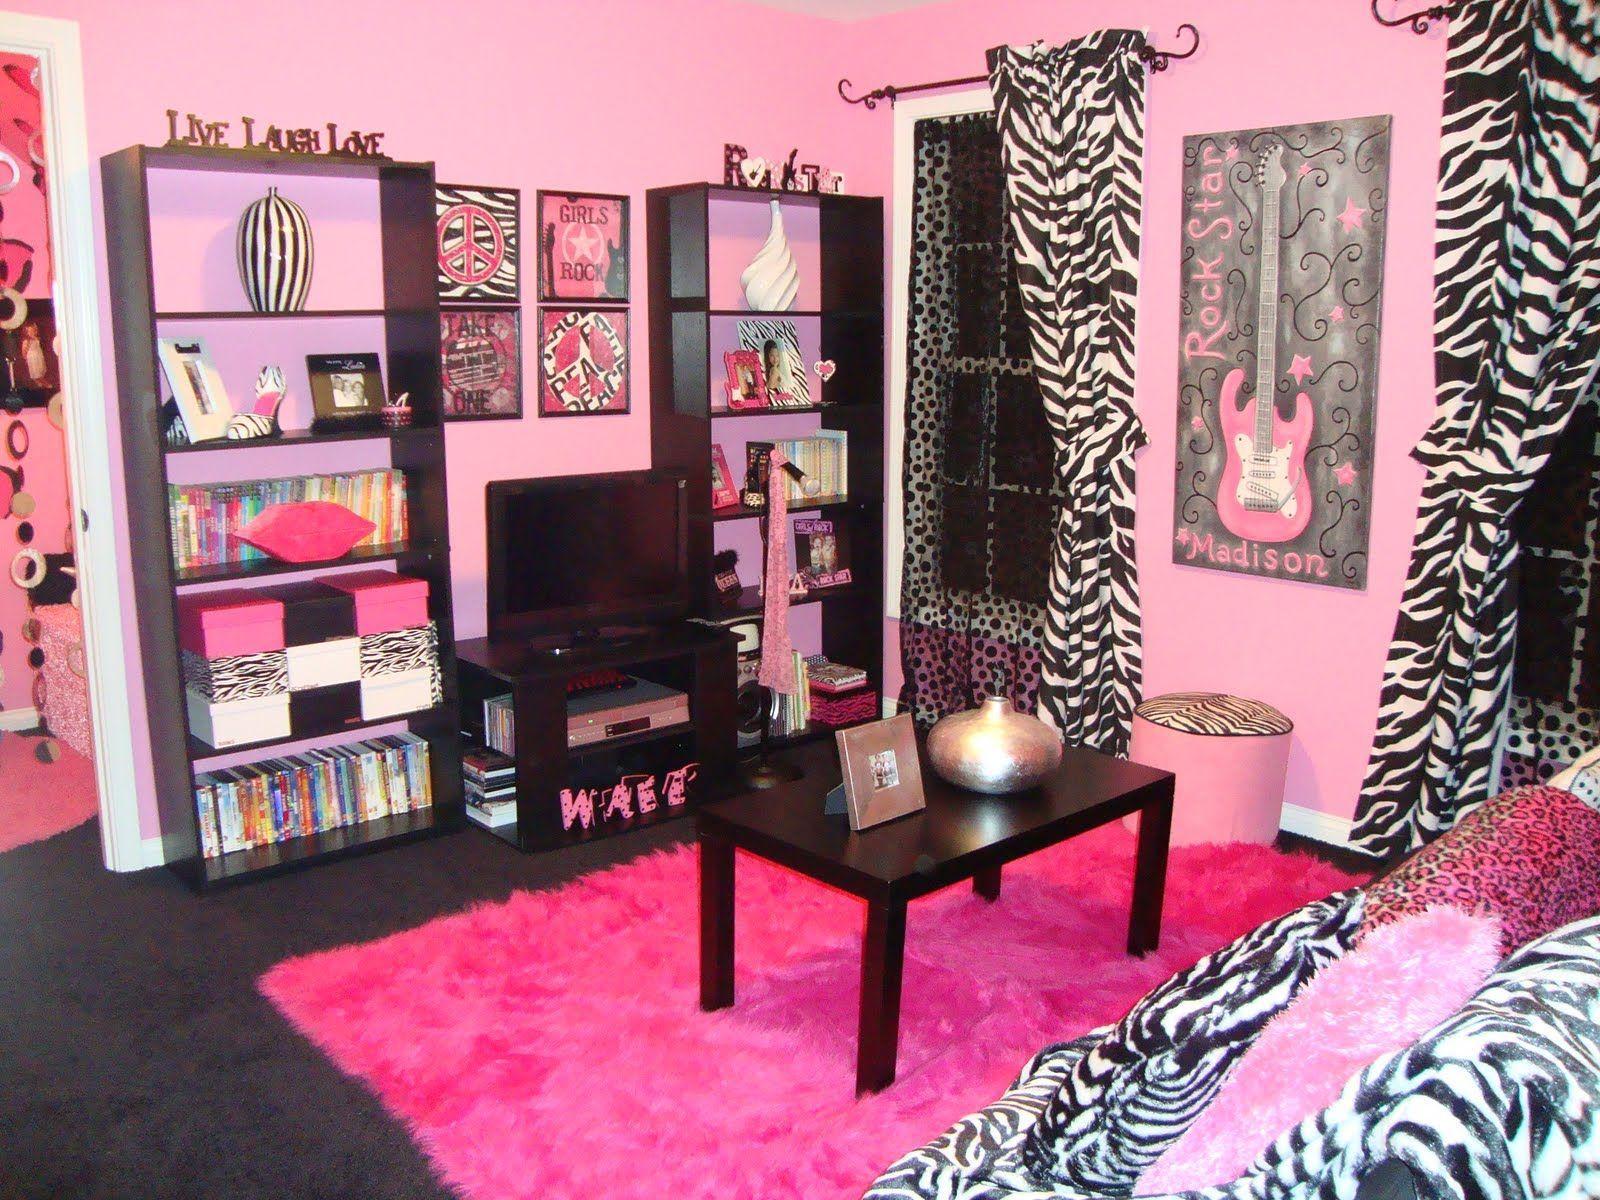 Living Ideas Bedroom Carpet Stool Pink Curns Charming Light Light Pink Bedroom Carpet Carpet Vidalondon Champagne Bedroom Woman Bedroom Small Room Bedroom